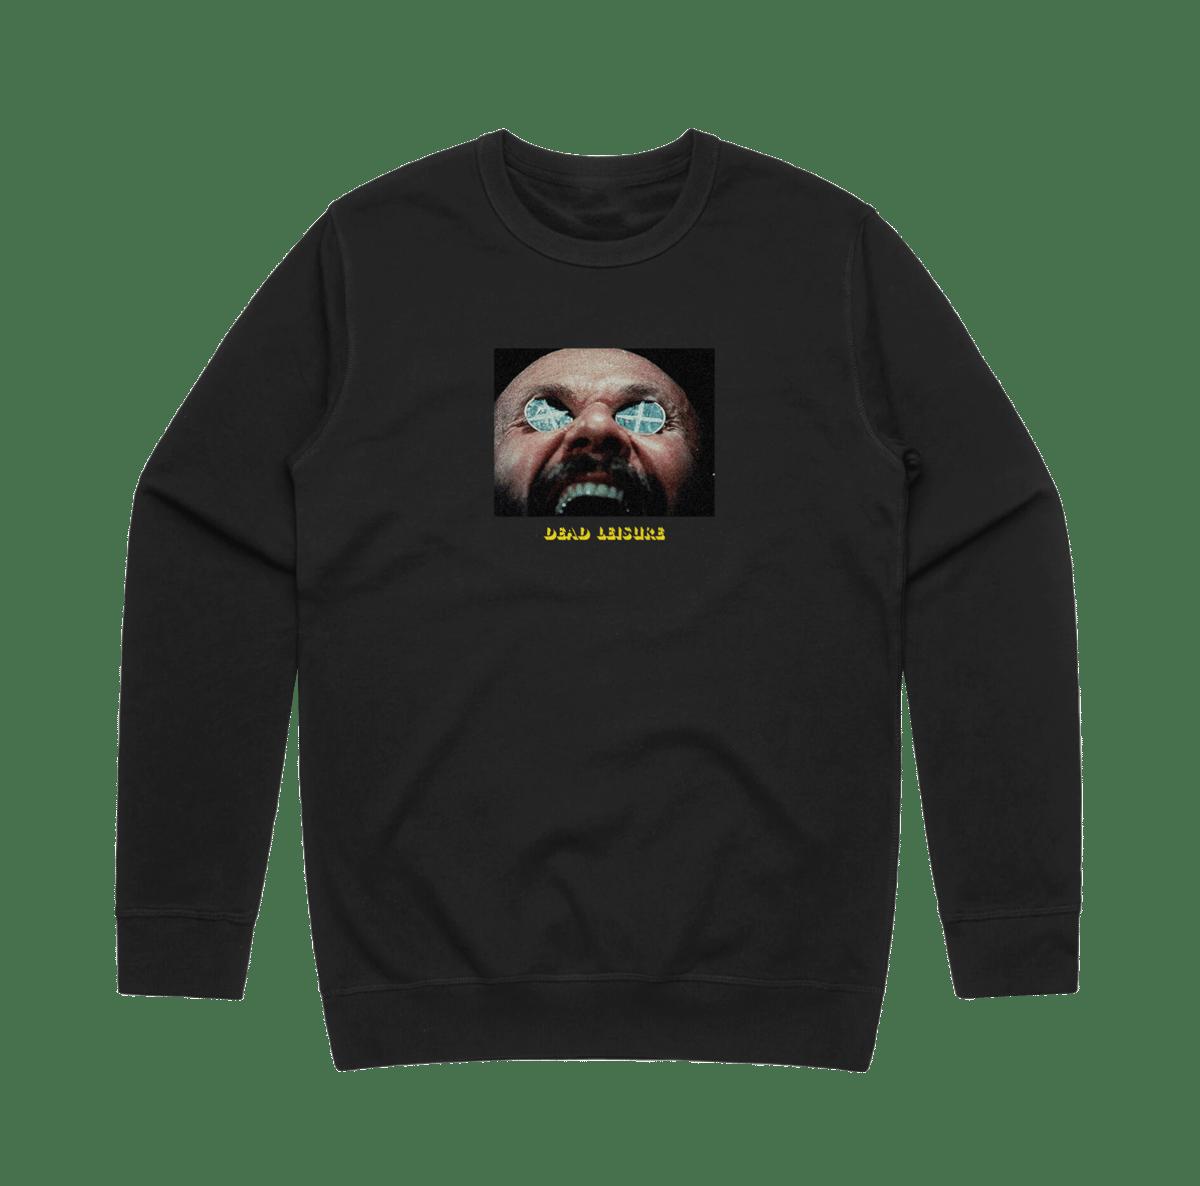 Awake & Afraid Crew Sweatshirt - Black